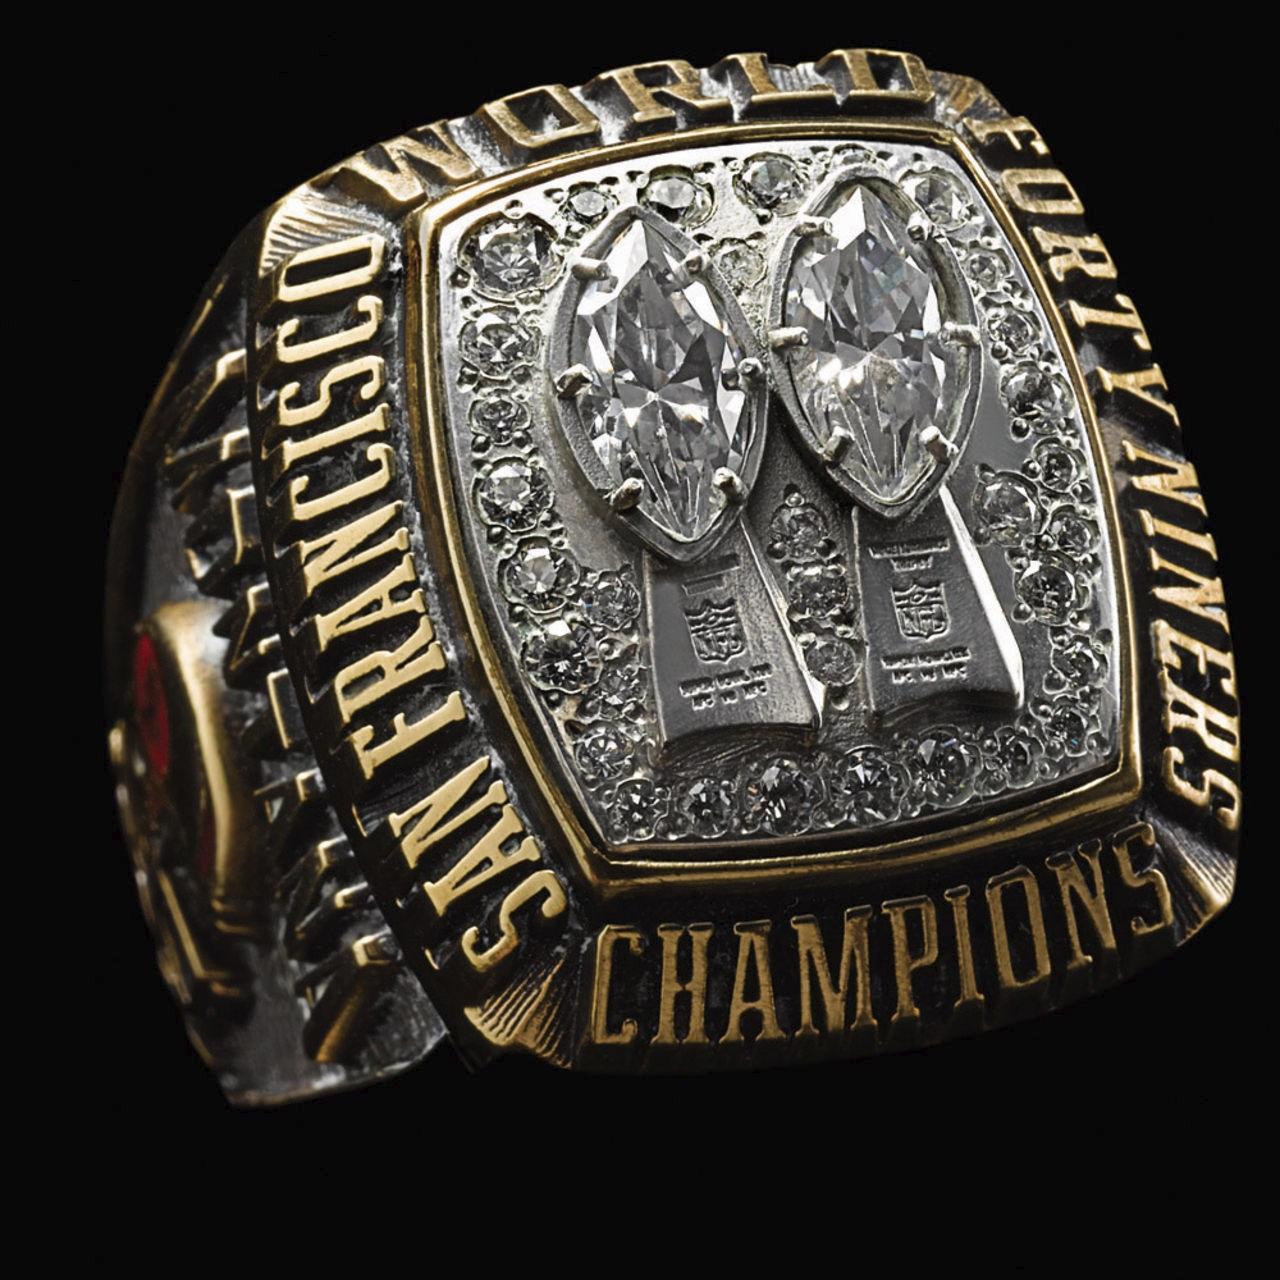 San Francisco 49ers 1985 champions ring